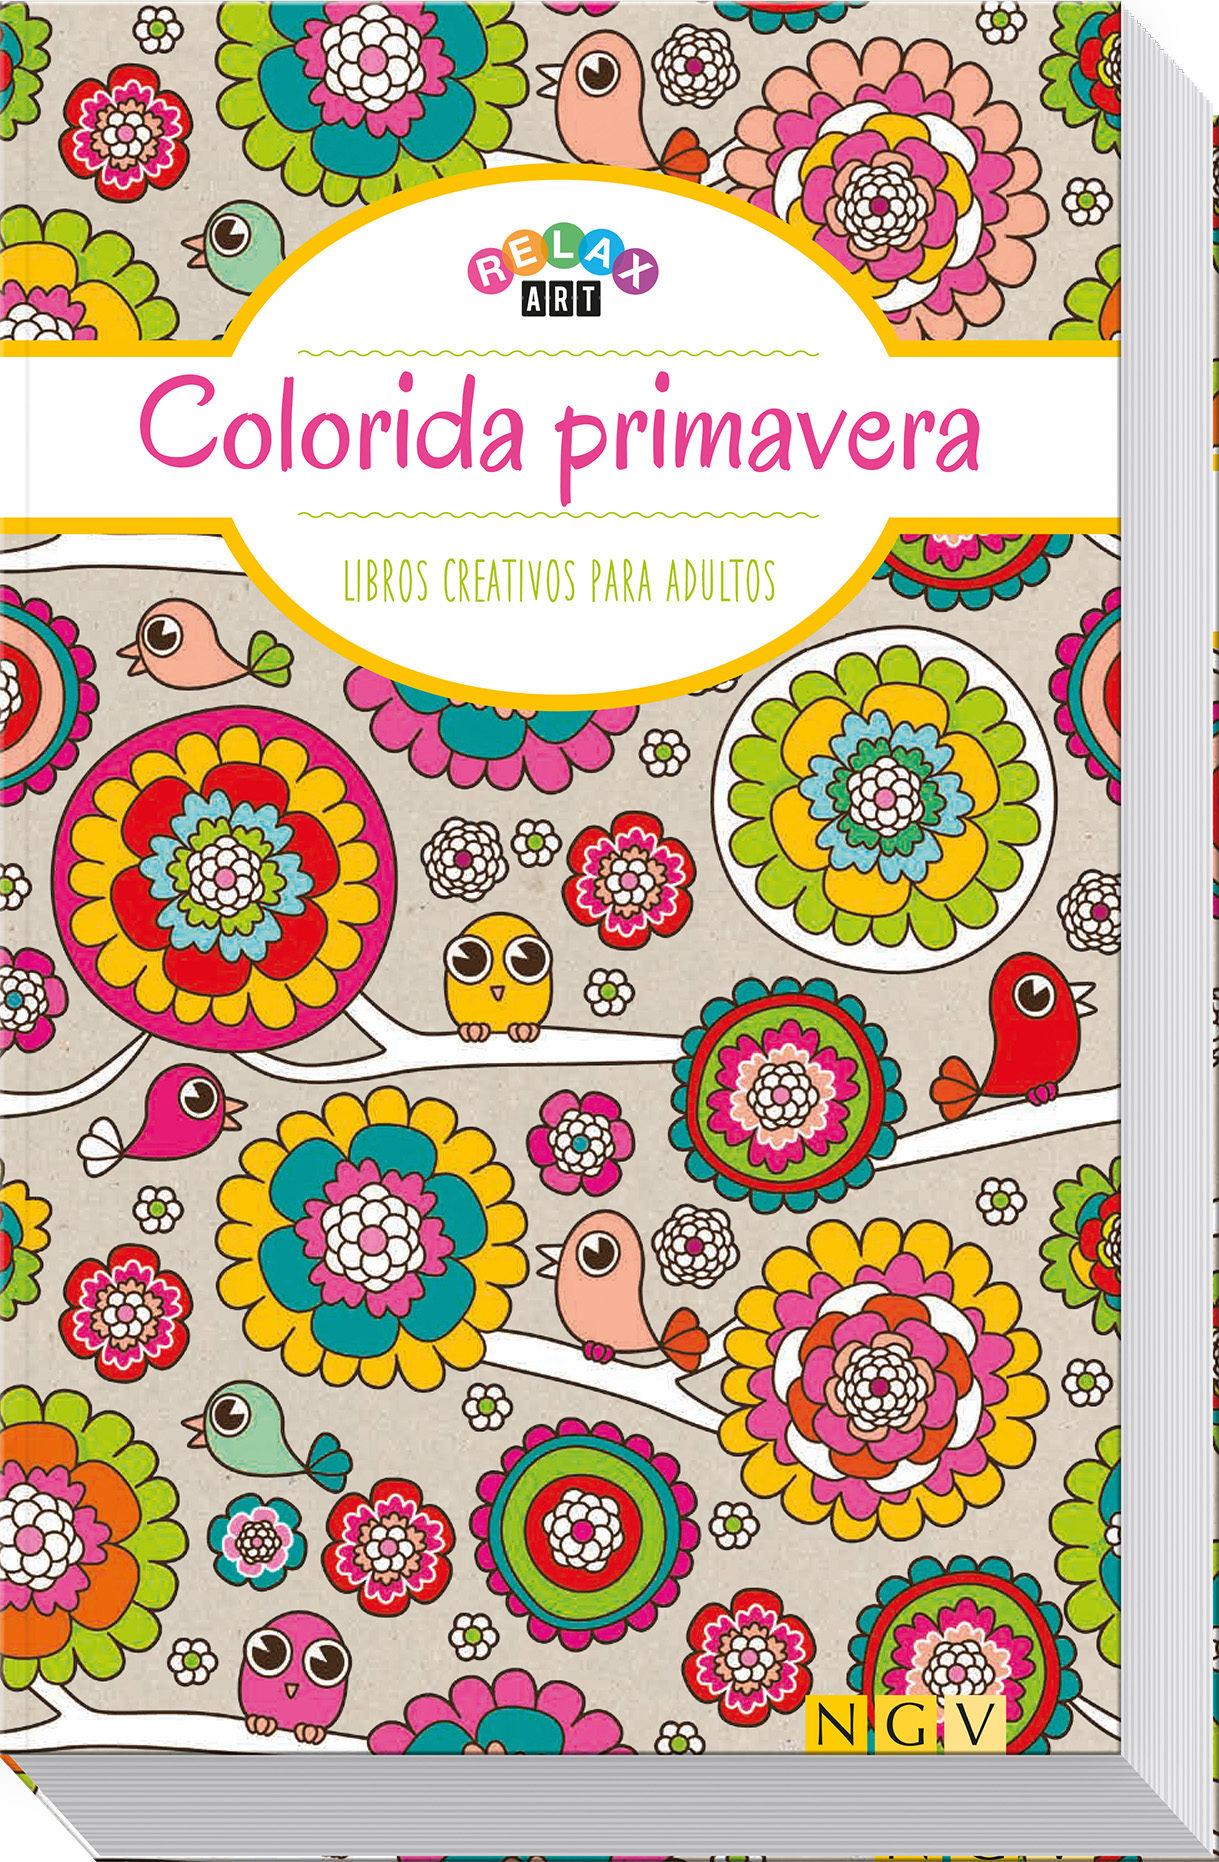 COLORIDA PRIMAVERA | VV.AA. | Comprar libro 9783869416632